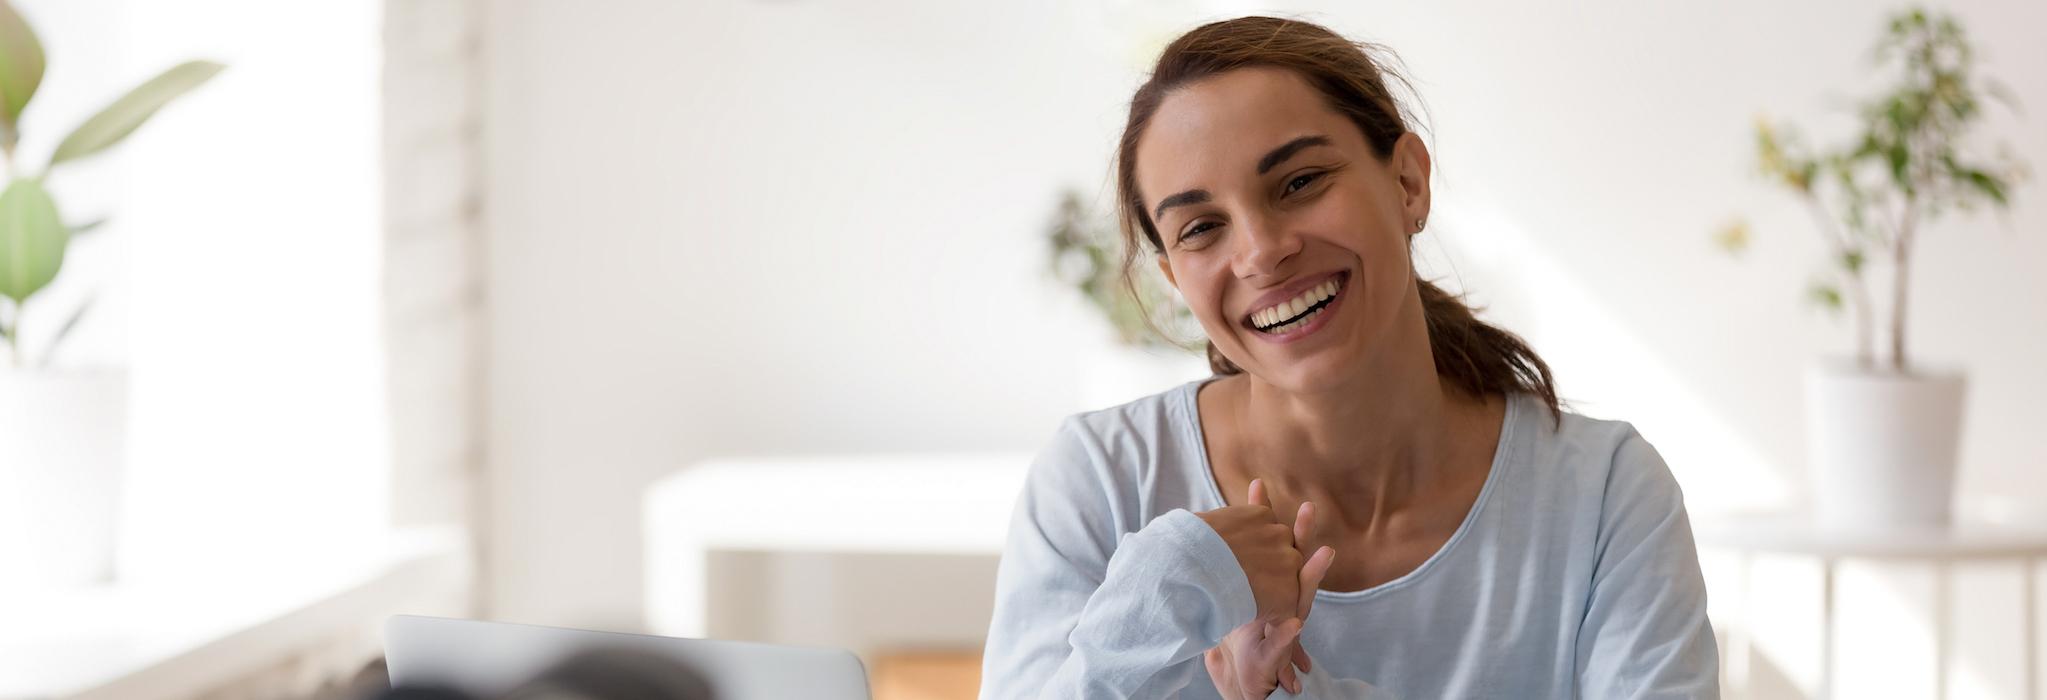 Woman managing marketing website